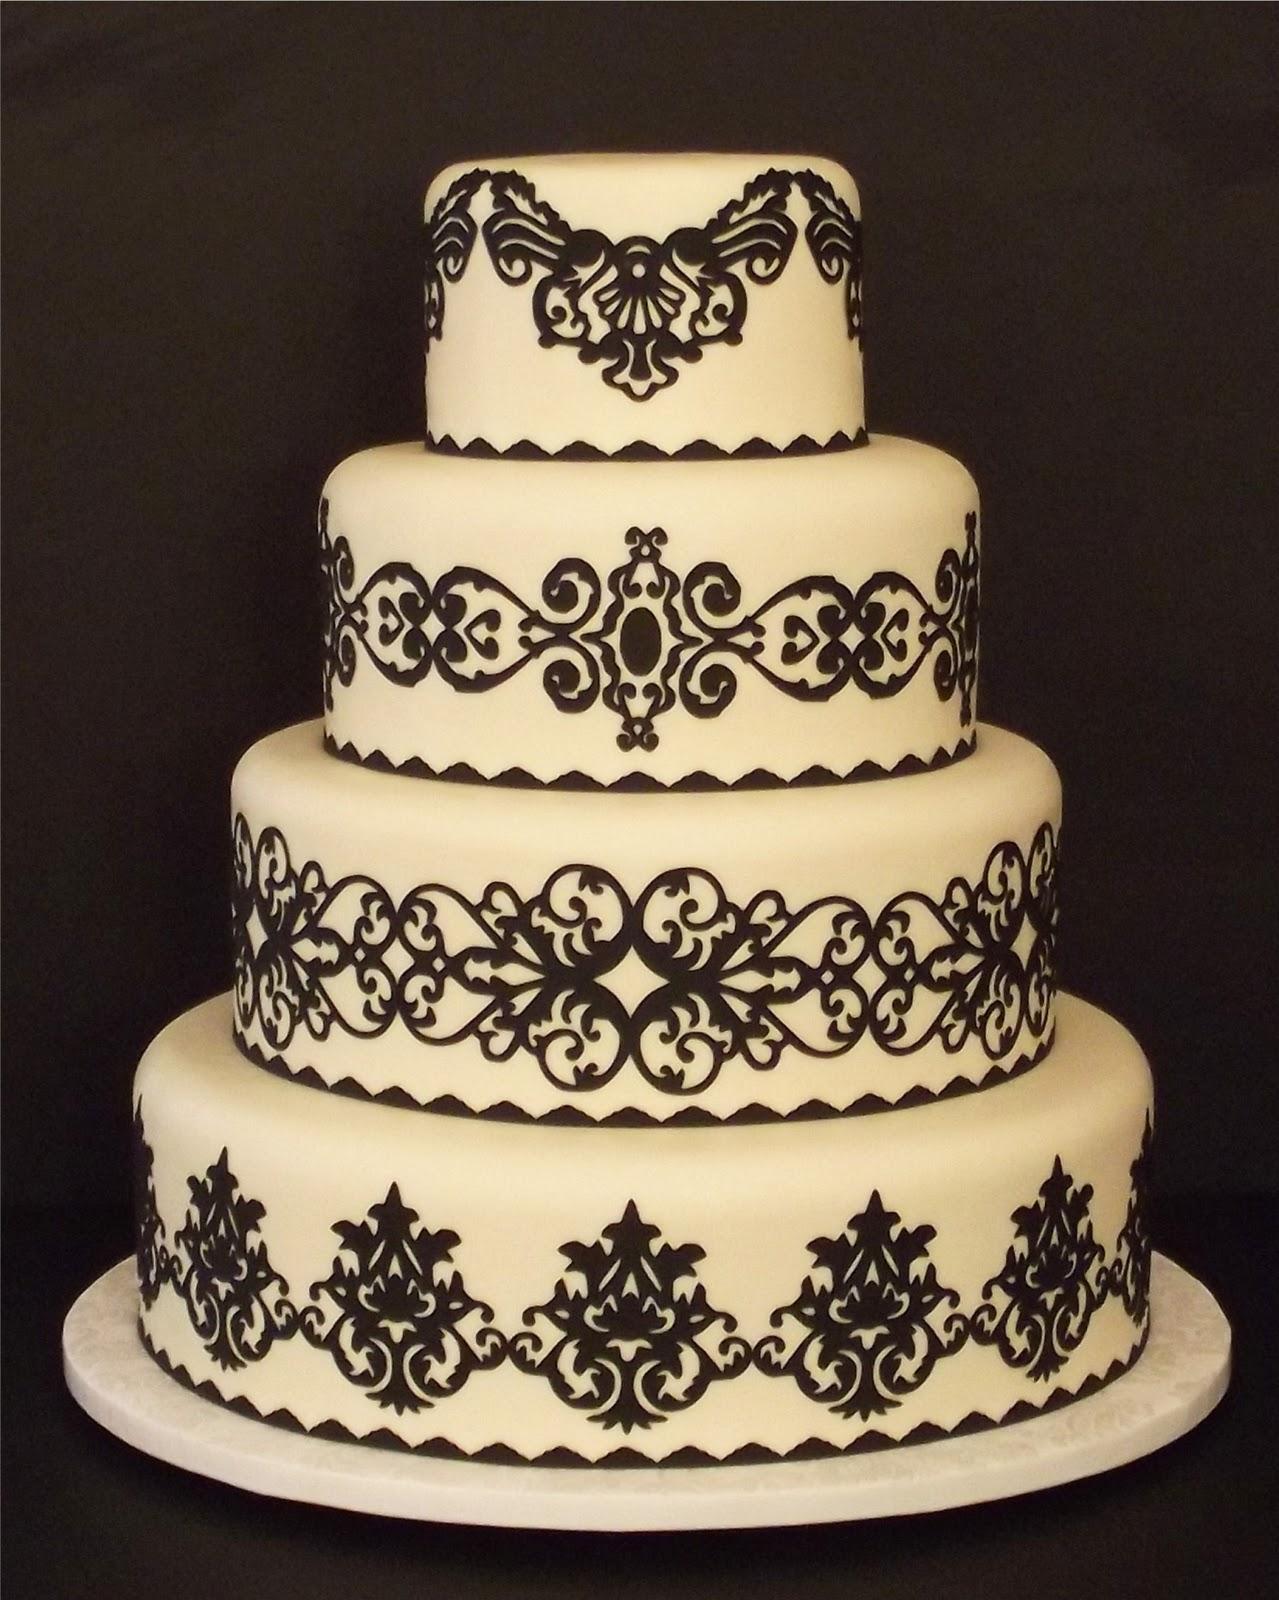 Creative Designs For Cakes Pre Cut Wedding Cake Designs